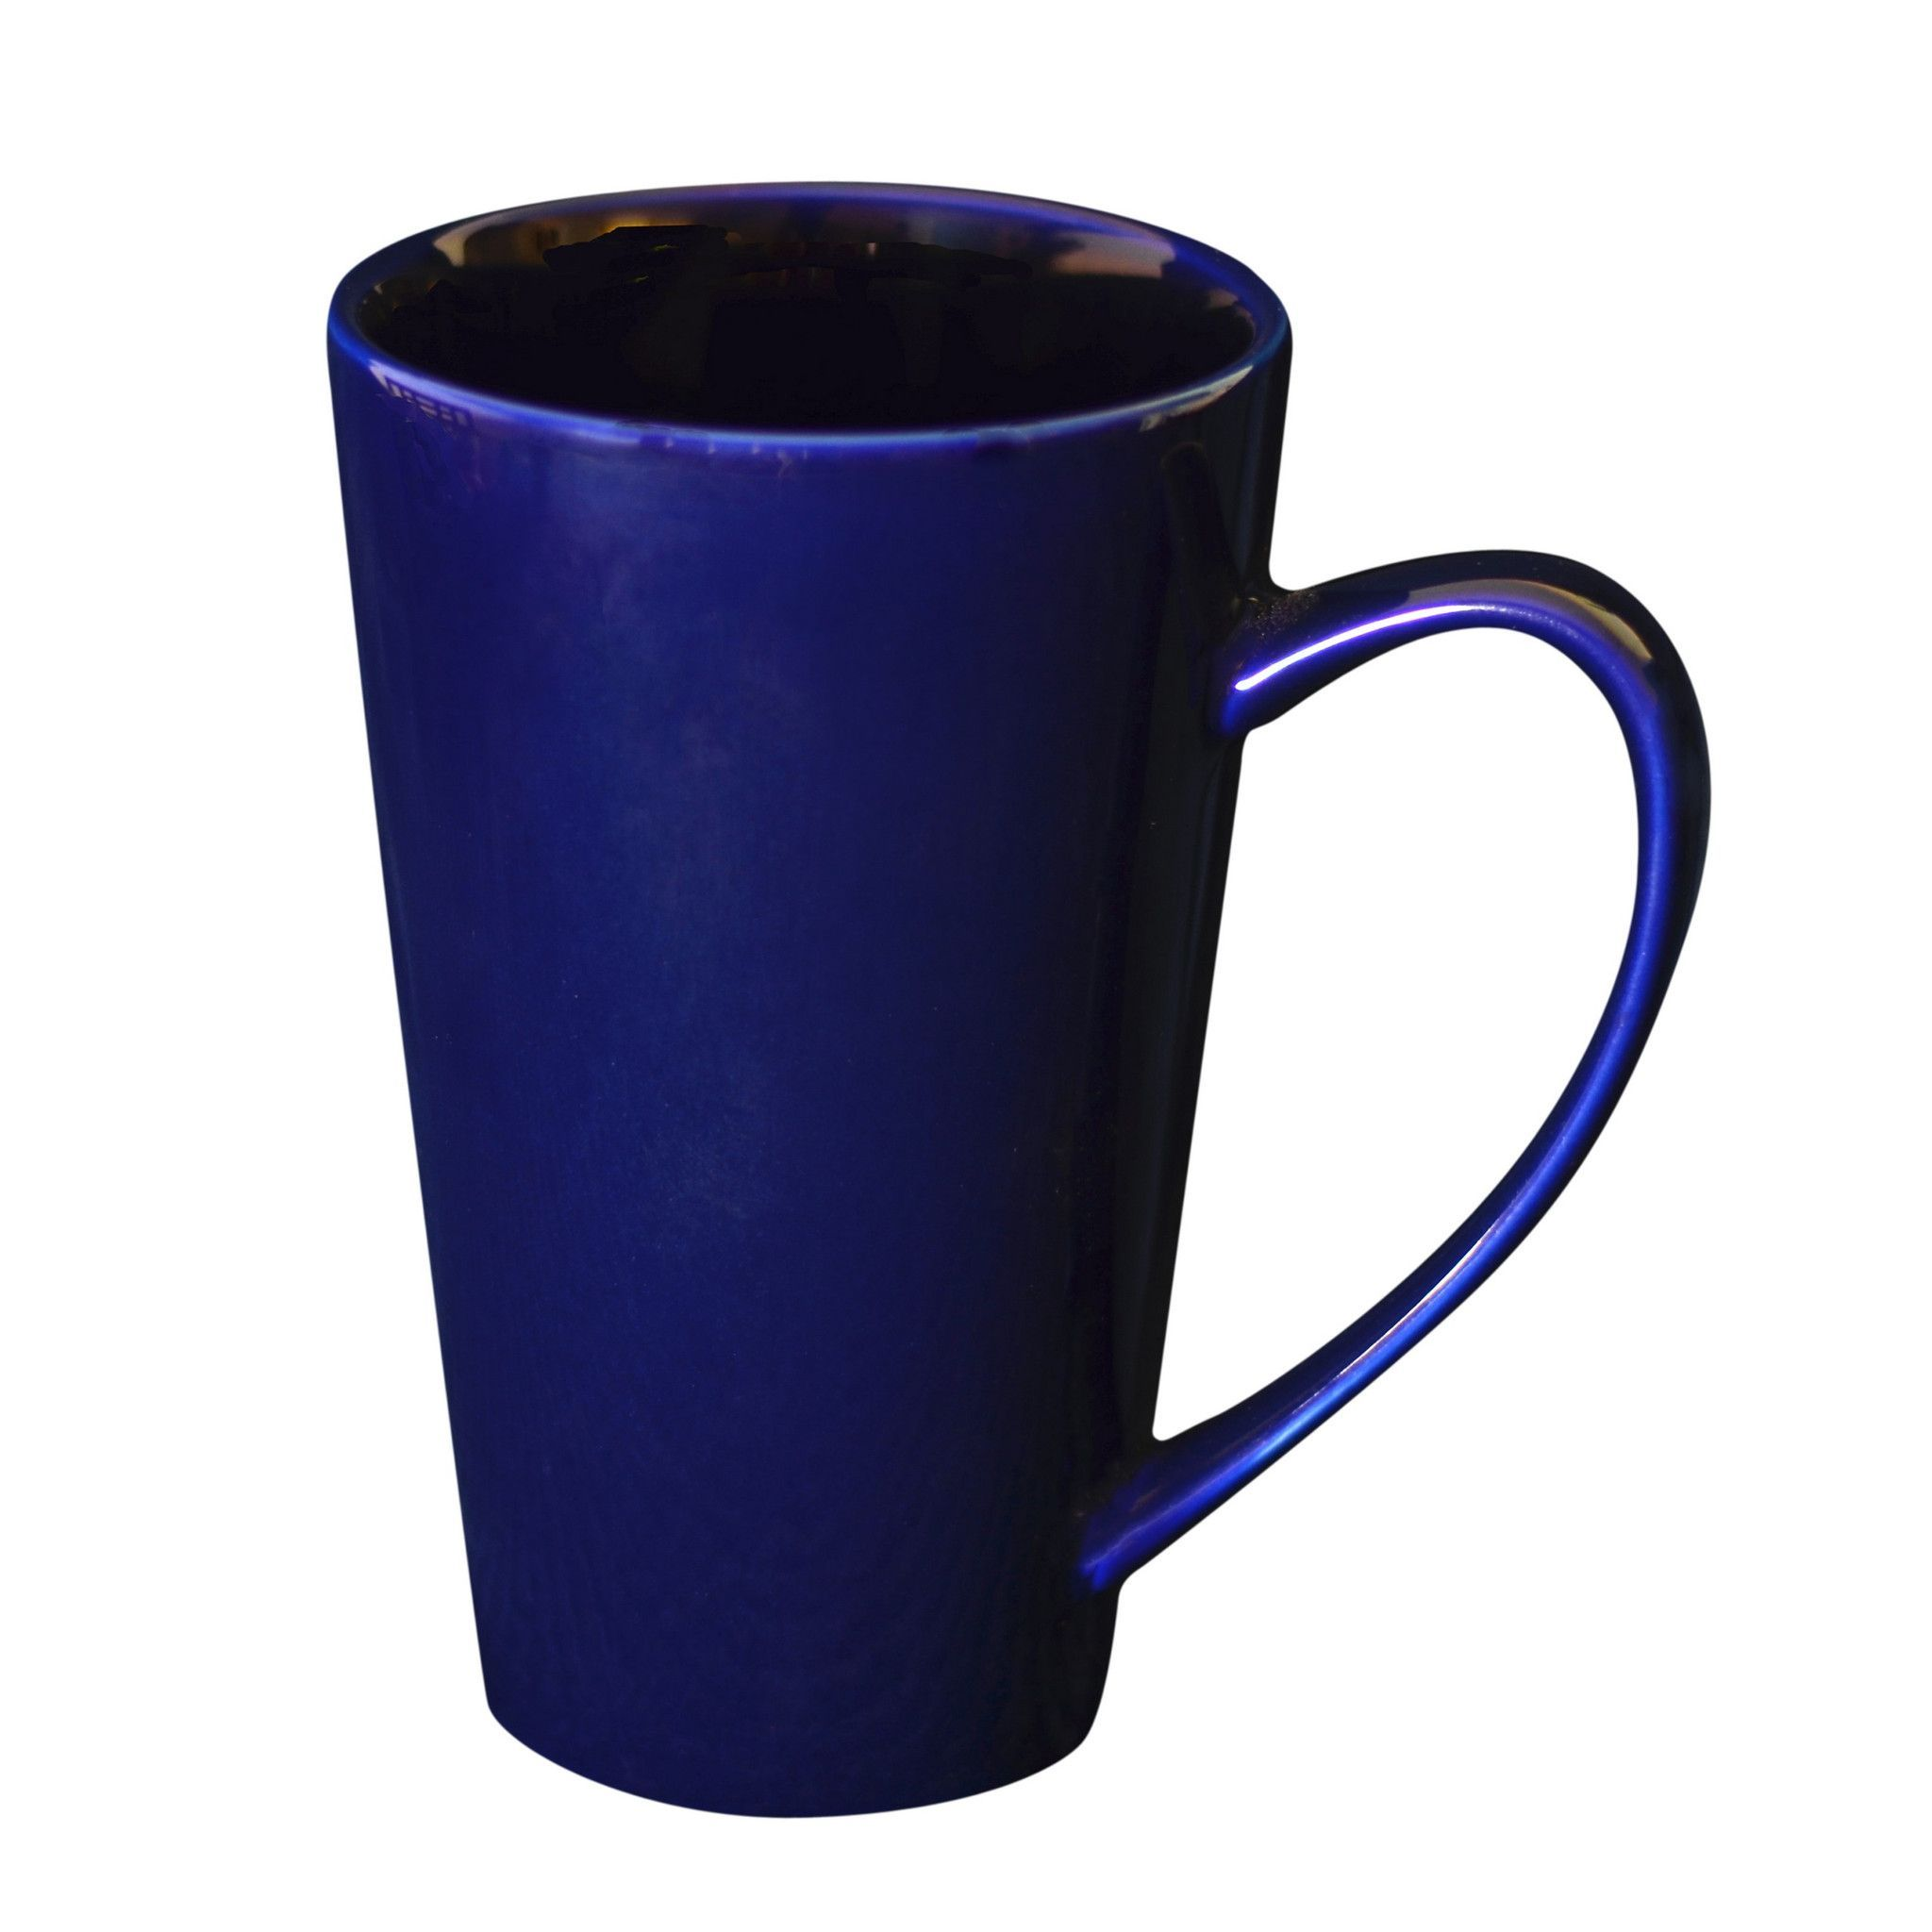 24 Oz. 4 1/4L x 3W x 7H Oversized Latte Mug Plum/Case Of 12